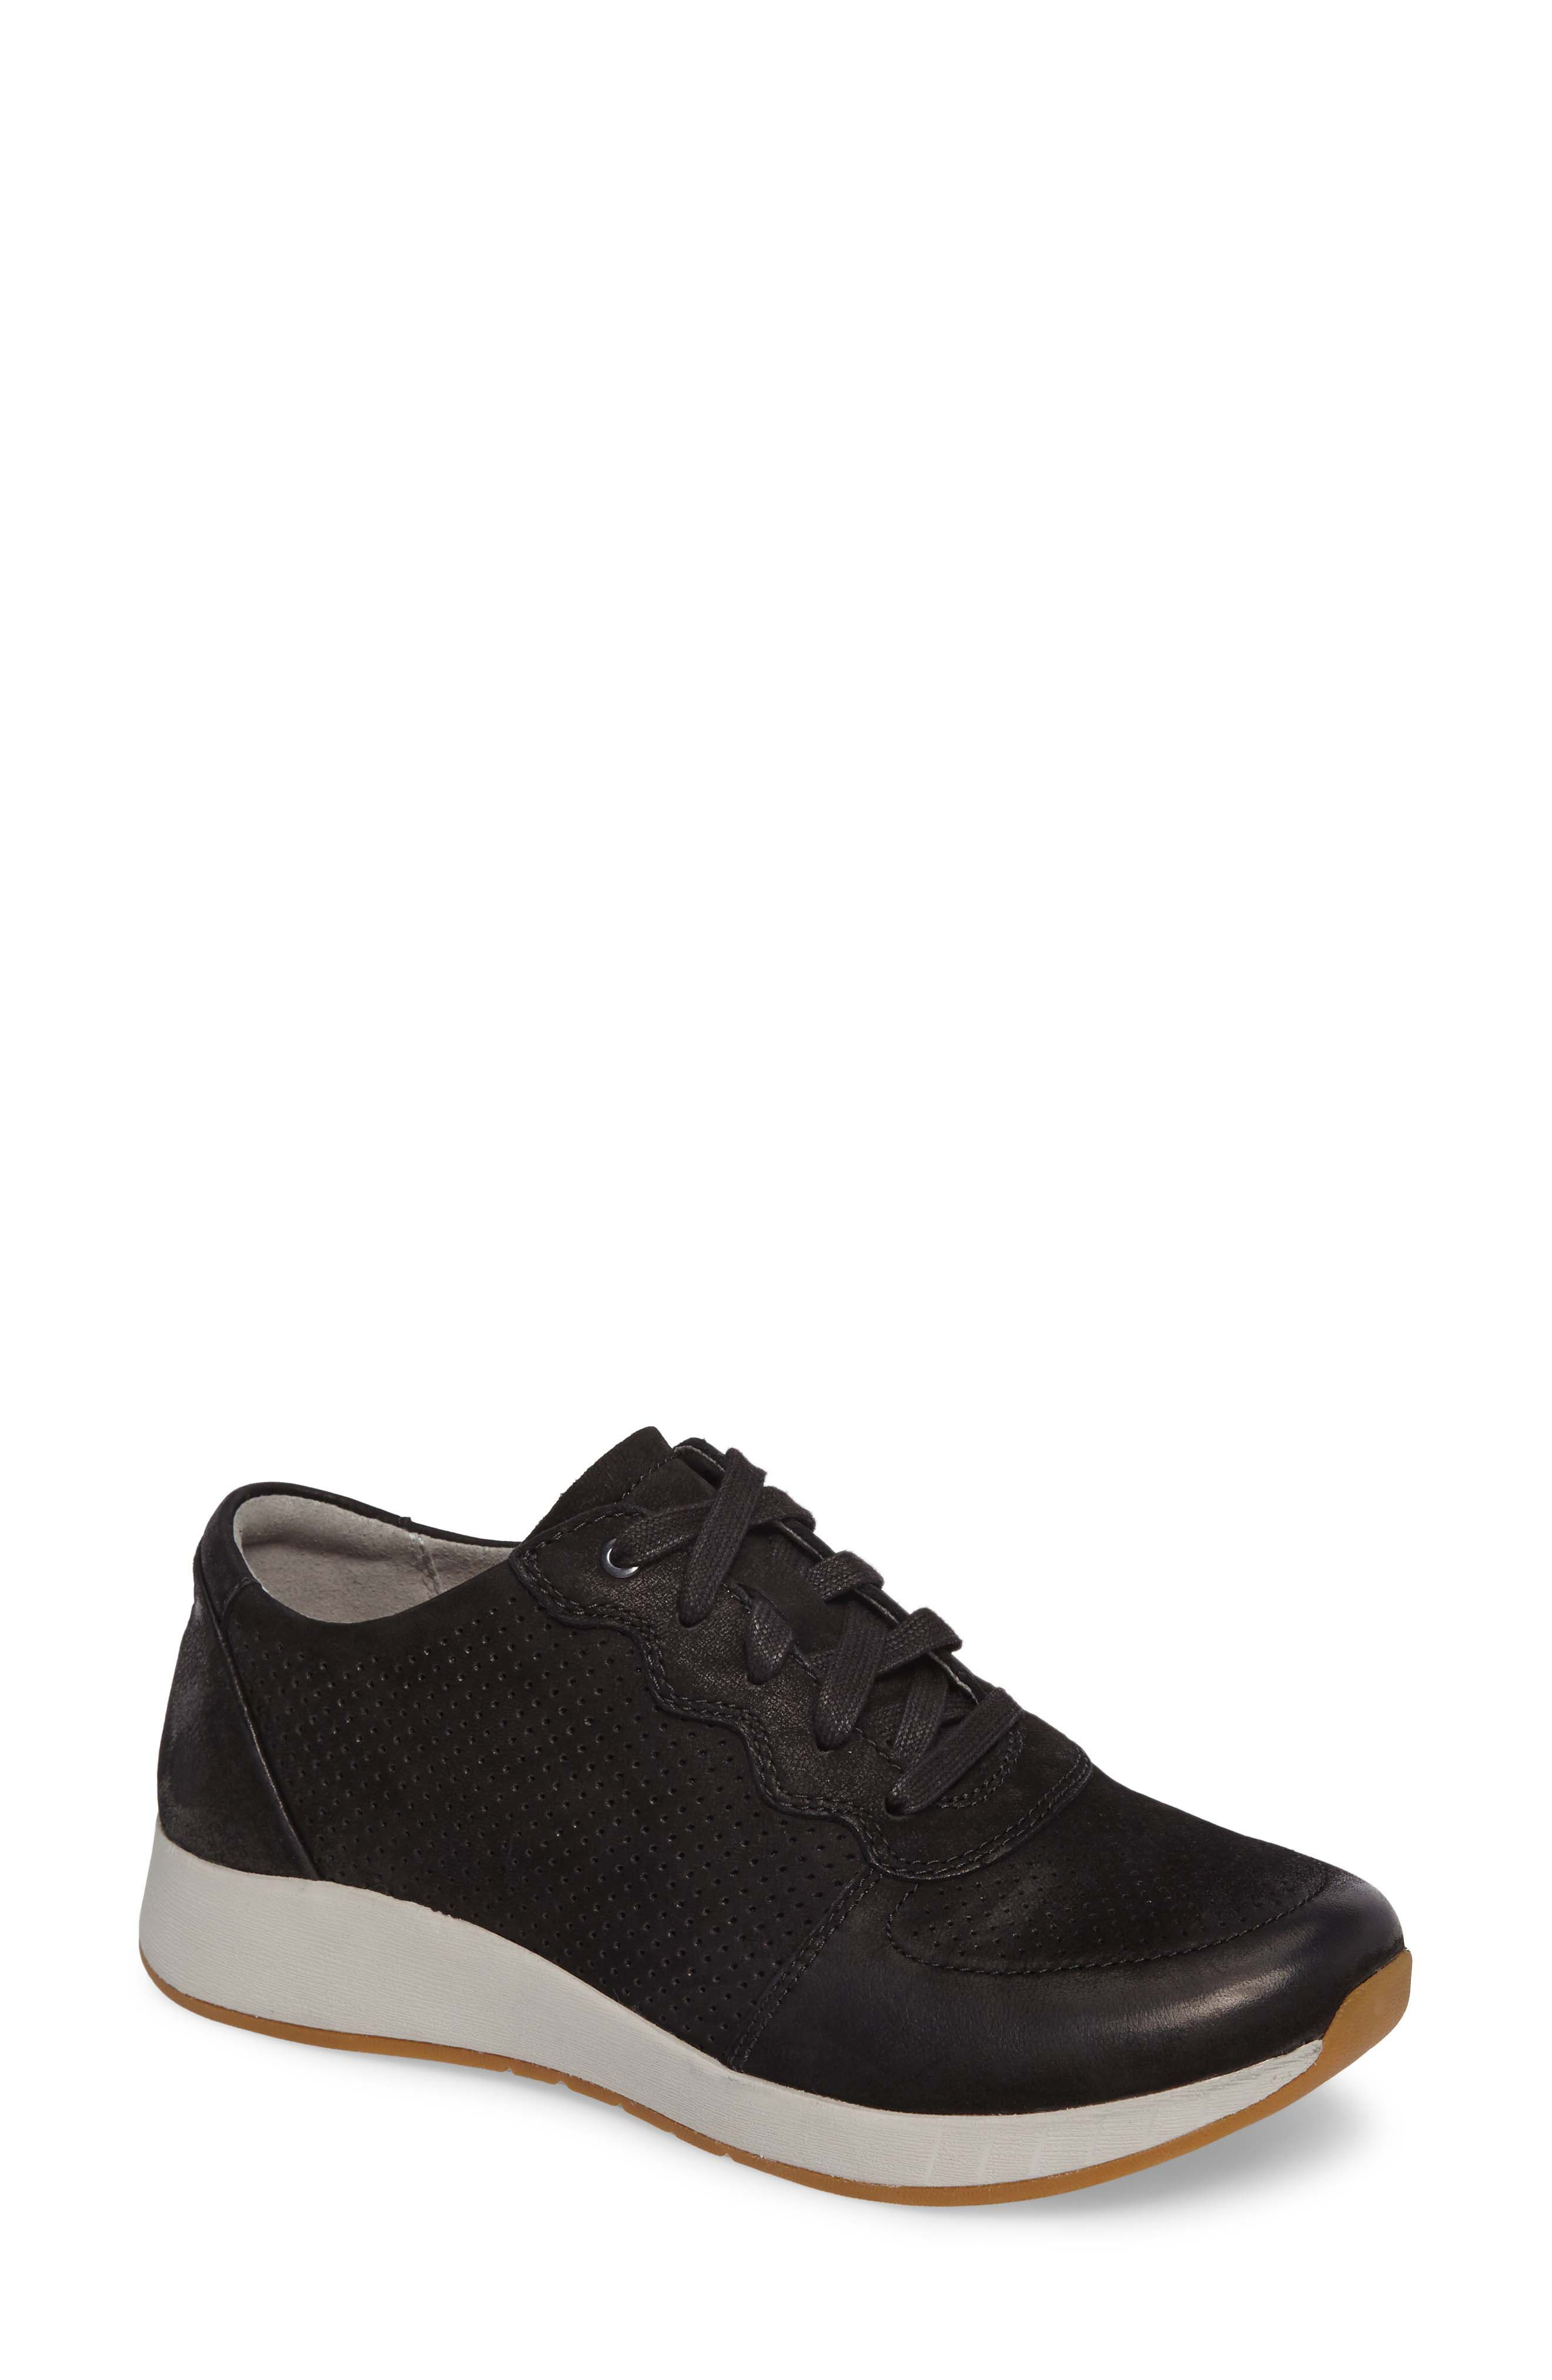 Christina Sneaker,                         Main,                         color, Black Nubuck Leather